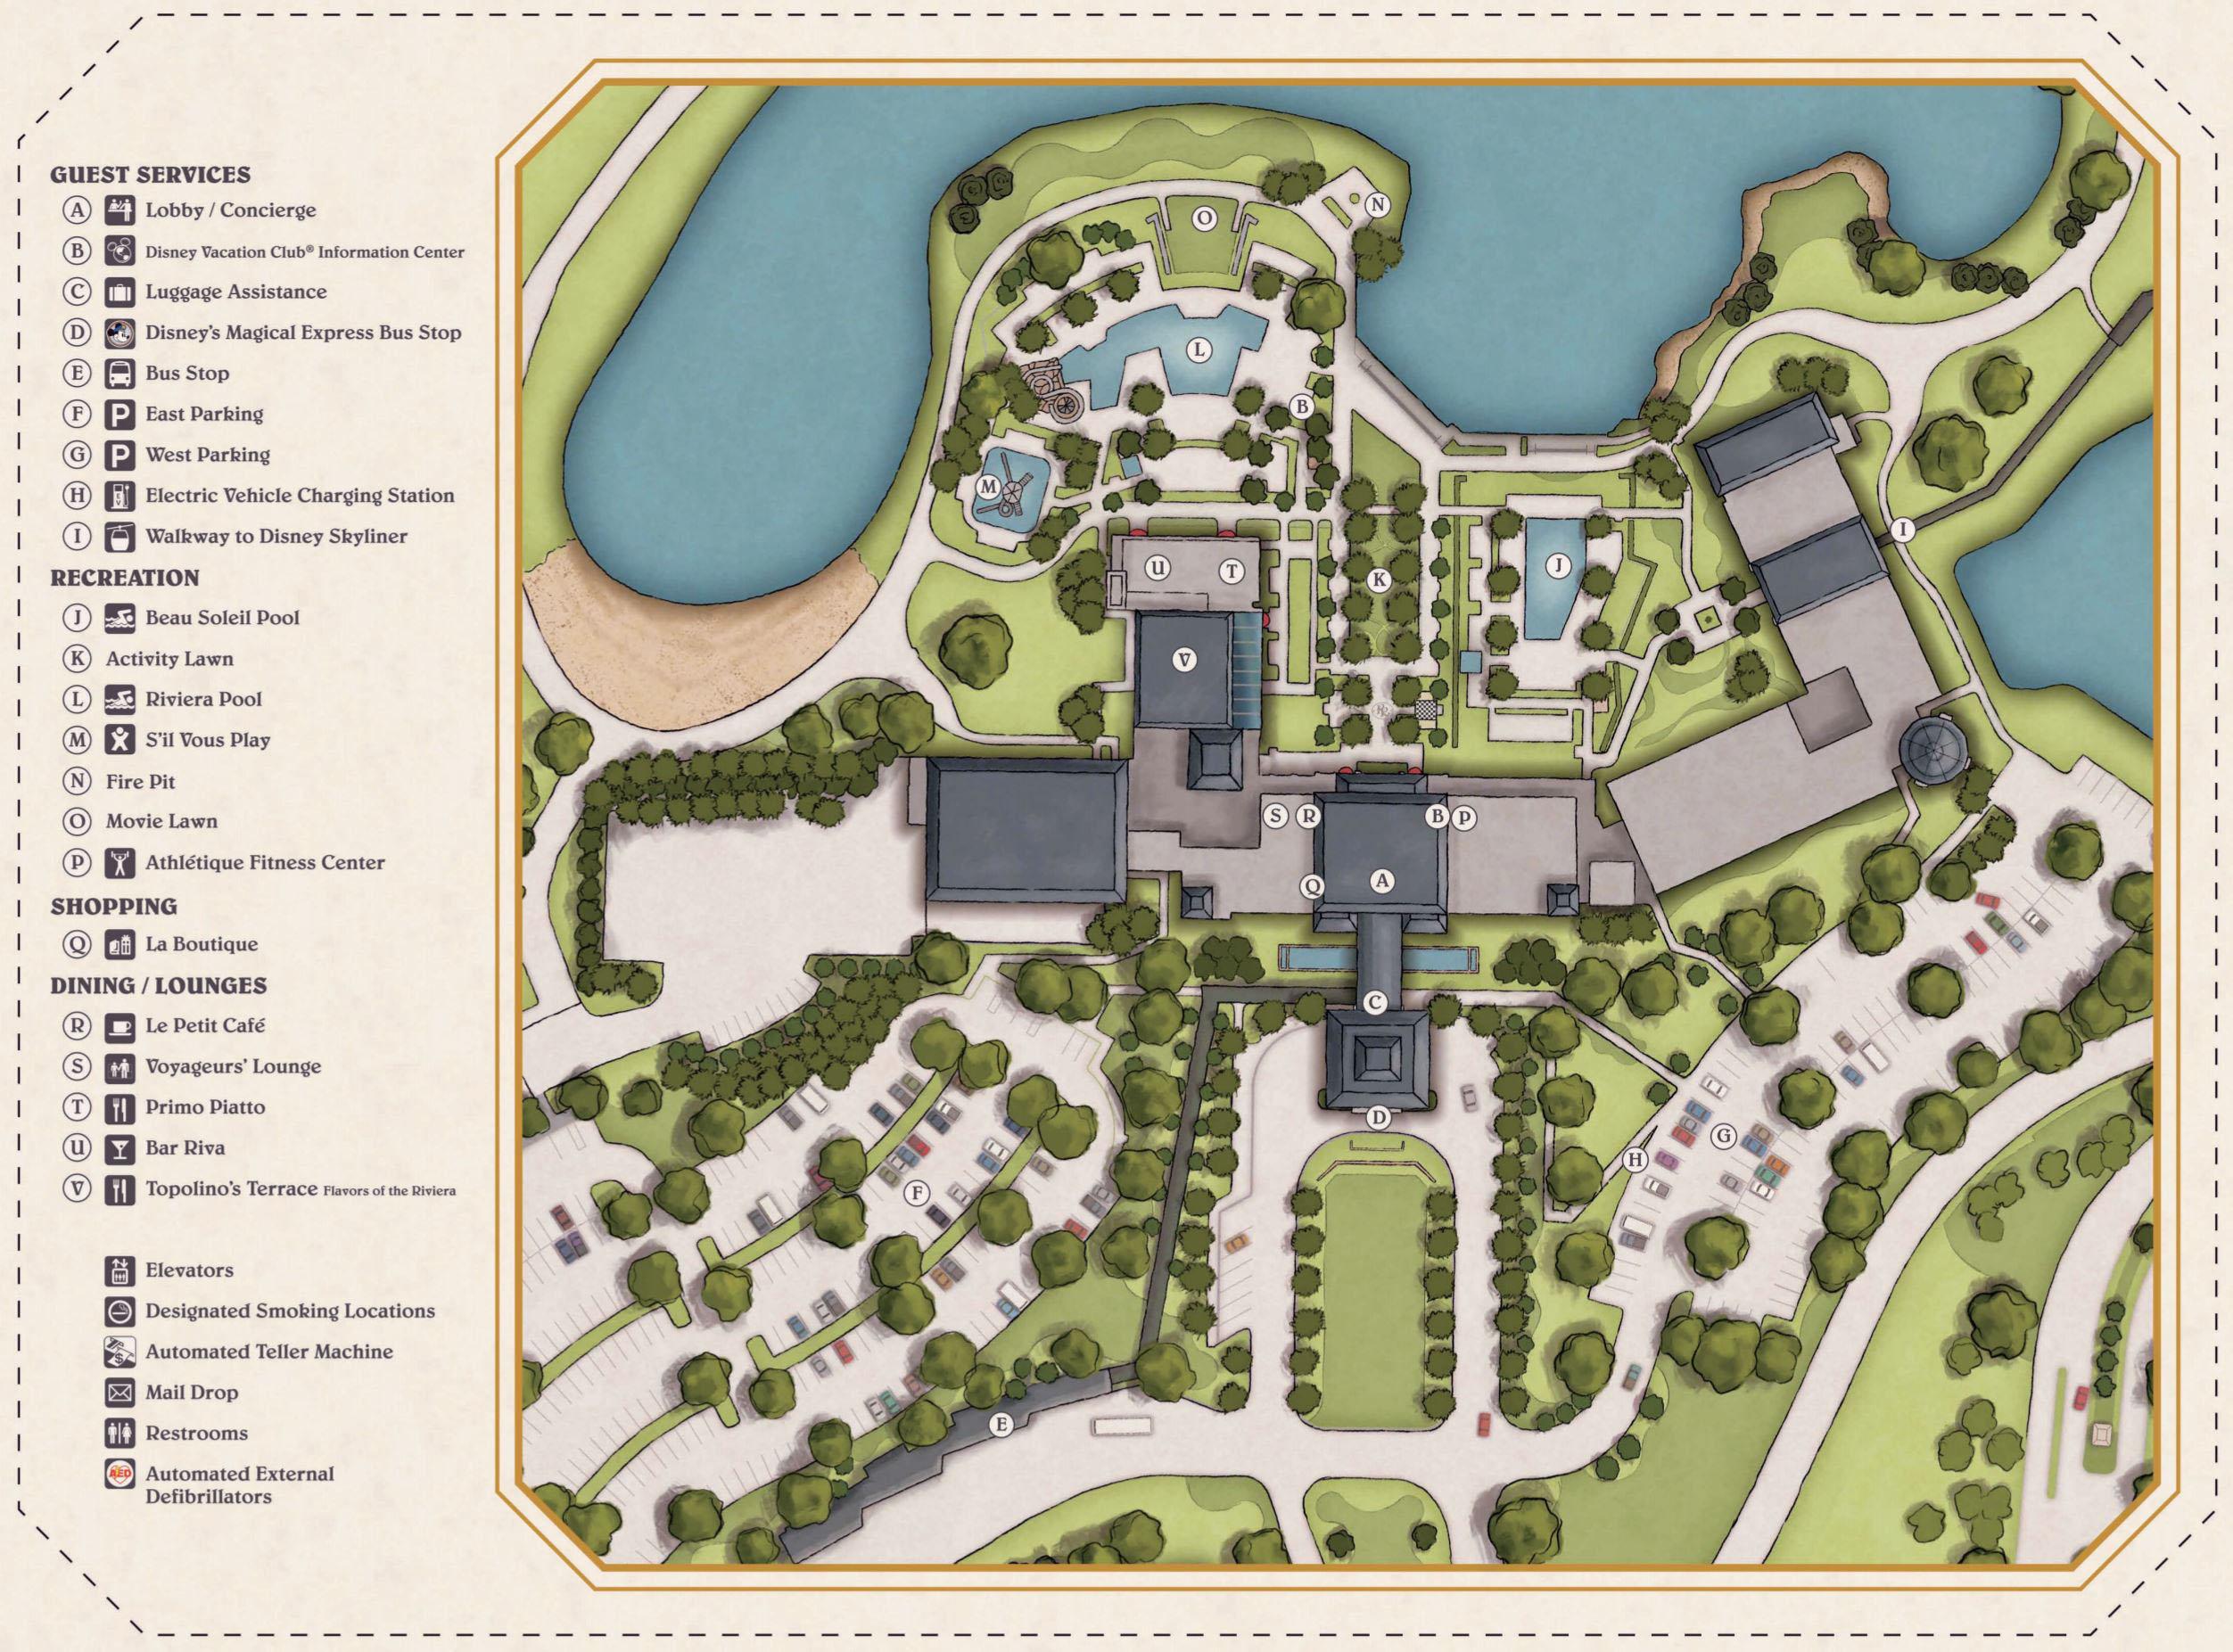 disney-riviera-resort-map - Blog Mickey on